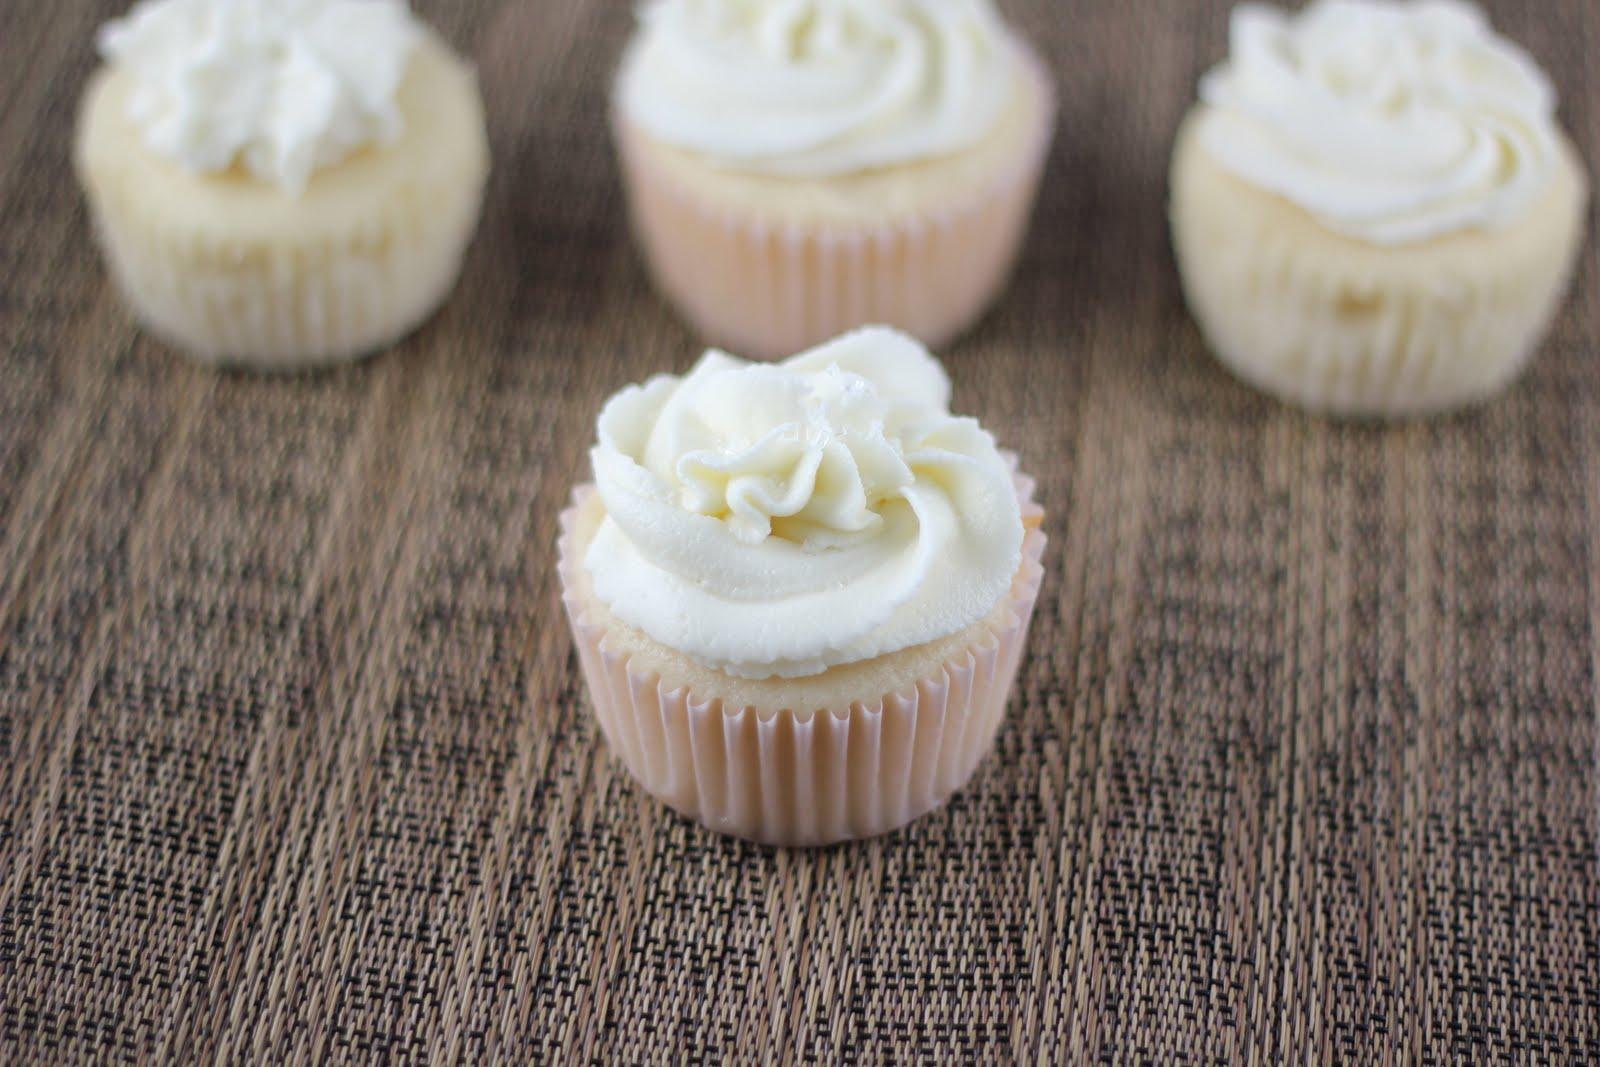 White Wedding Cake Cupcakes - A Zesty Bite